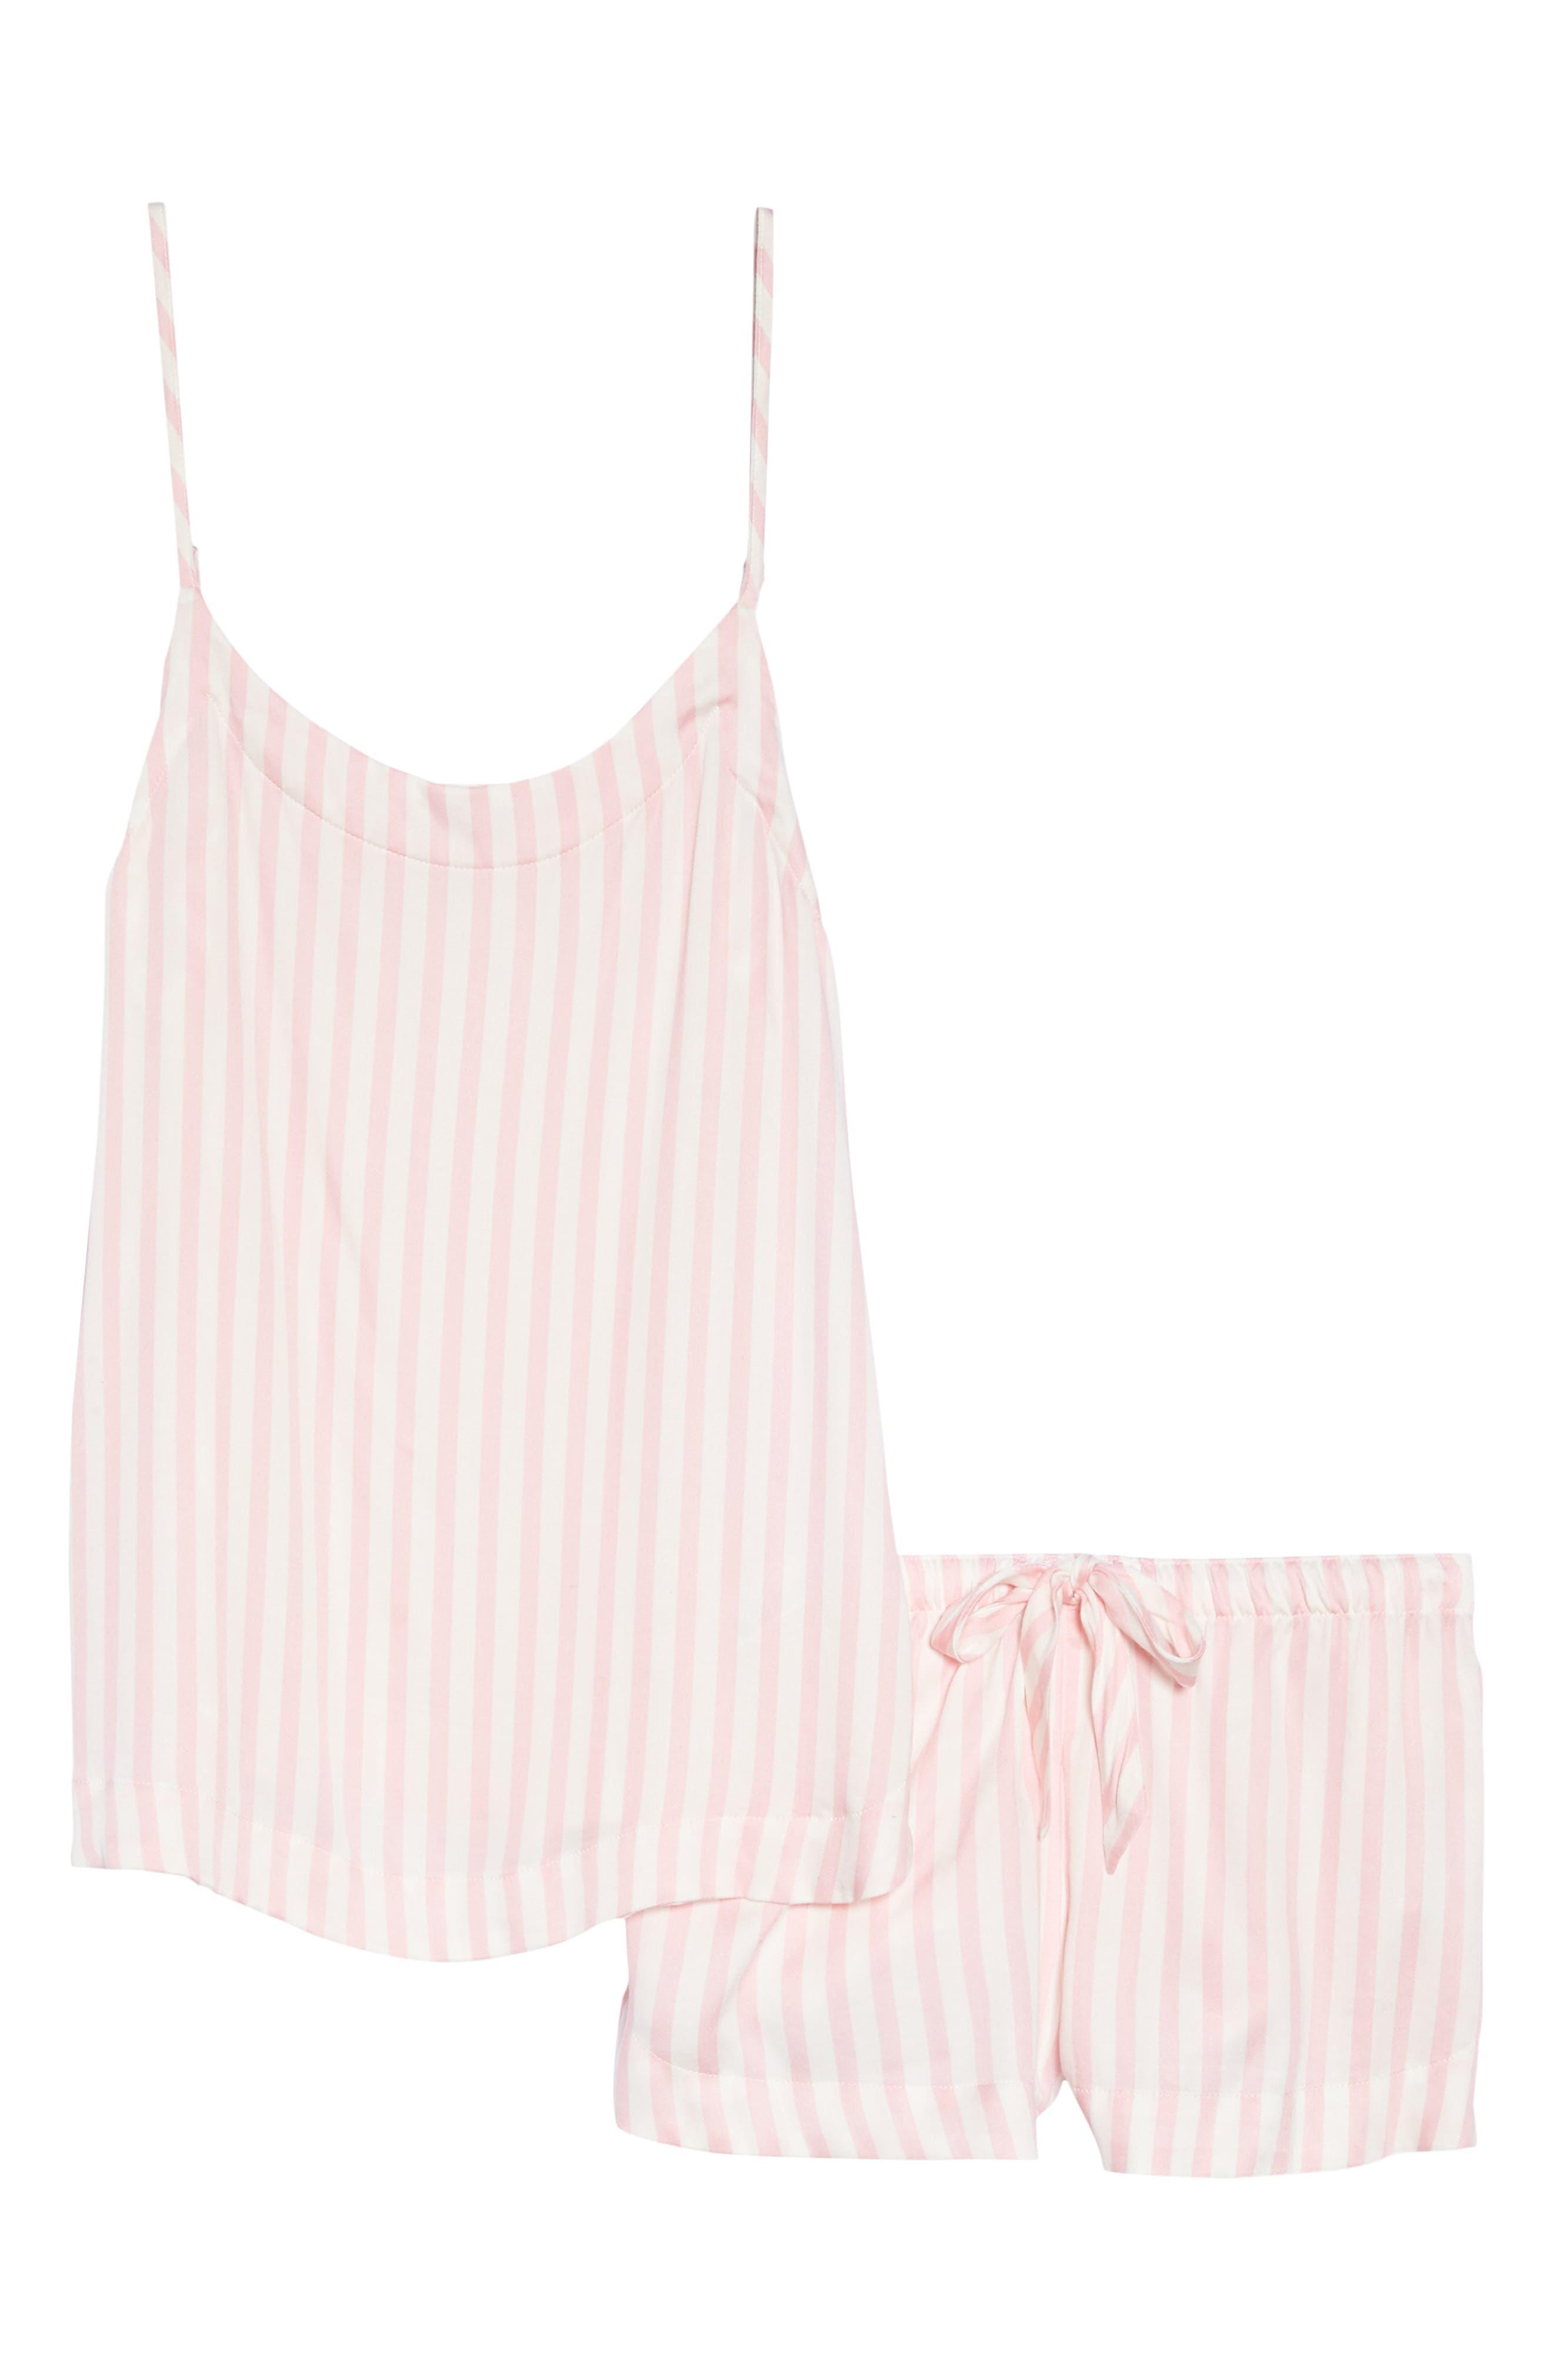 Short Pajamas,                             Alternate thumbnail 4, color,                             Pink